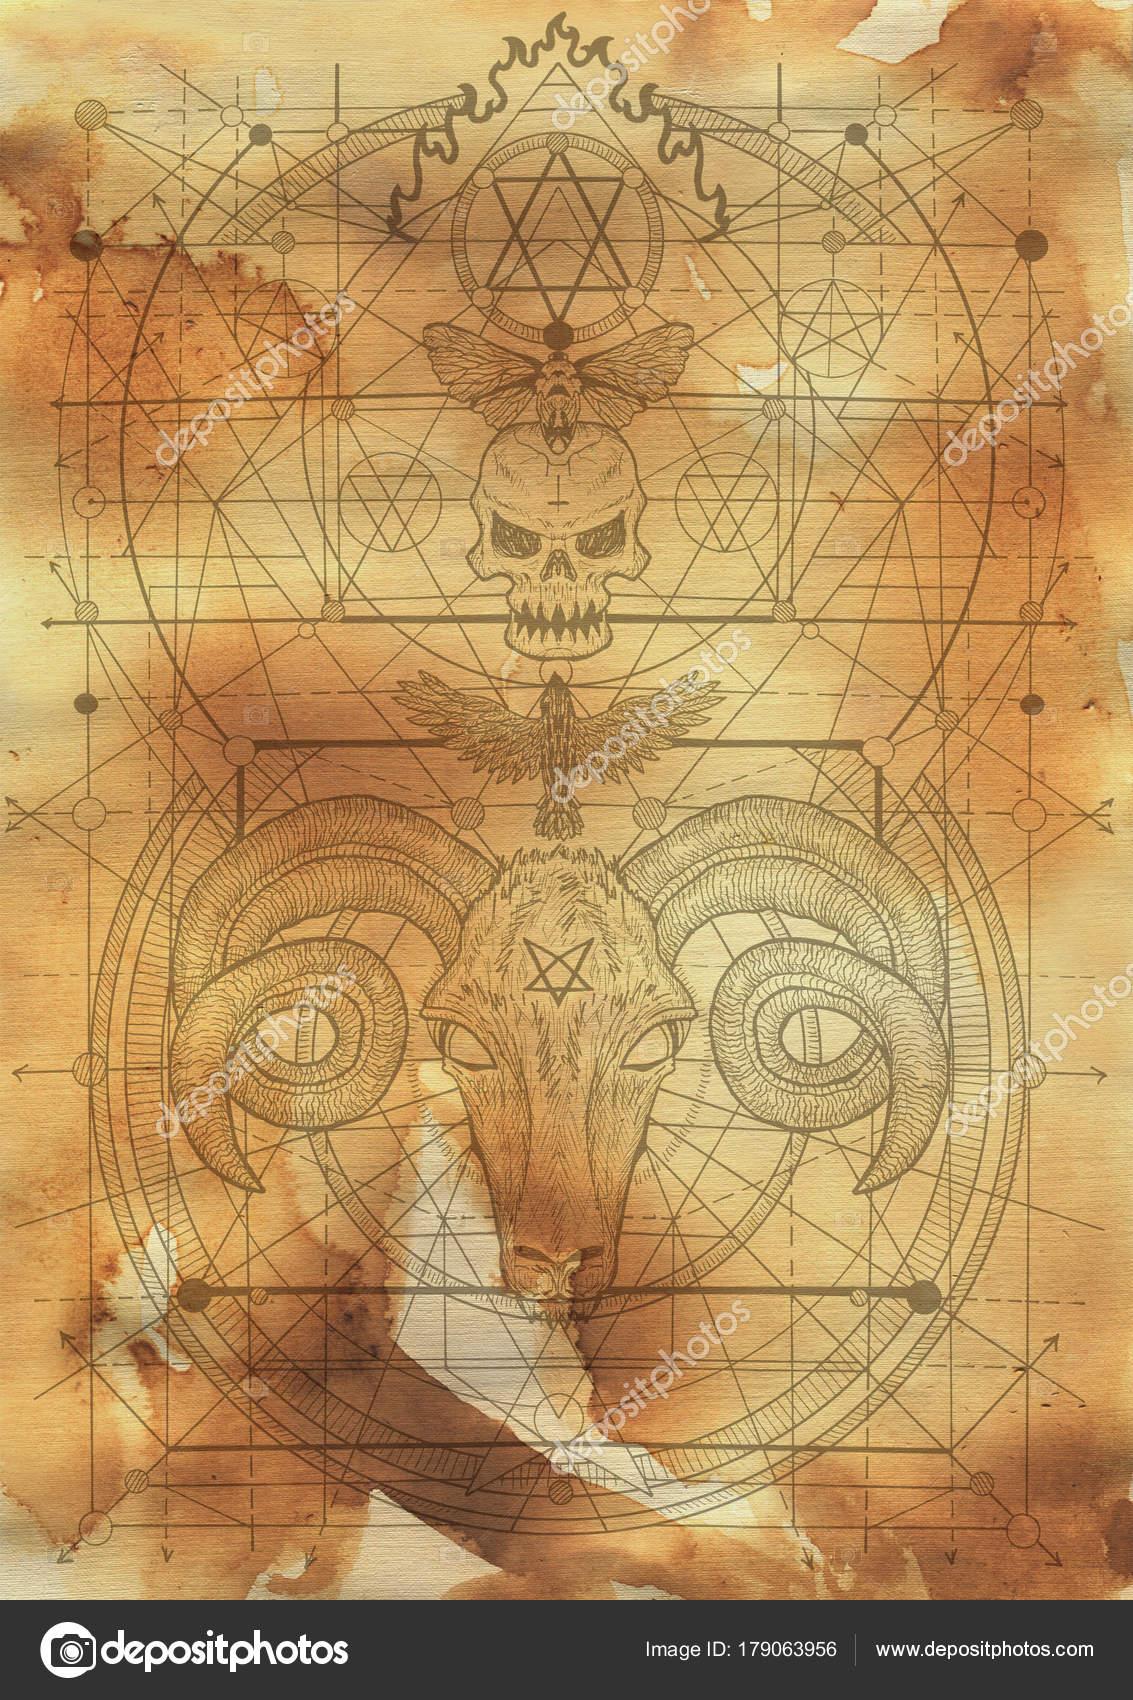 https://st3.depositphotos.com/3325457/17906/i/1600/depositphotos_179063956-stock-photo-scrapbook-design-background-devil-death.jpg